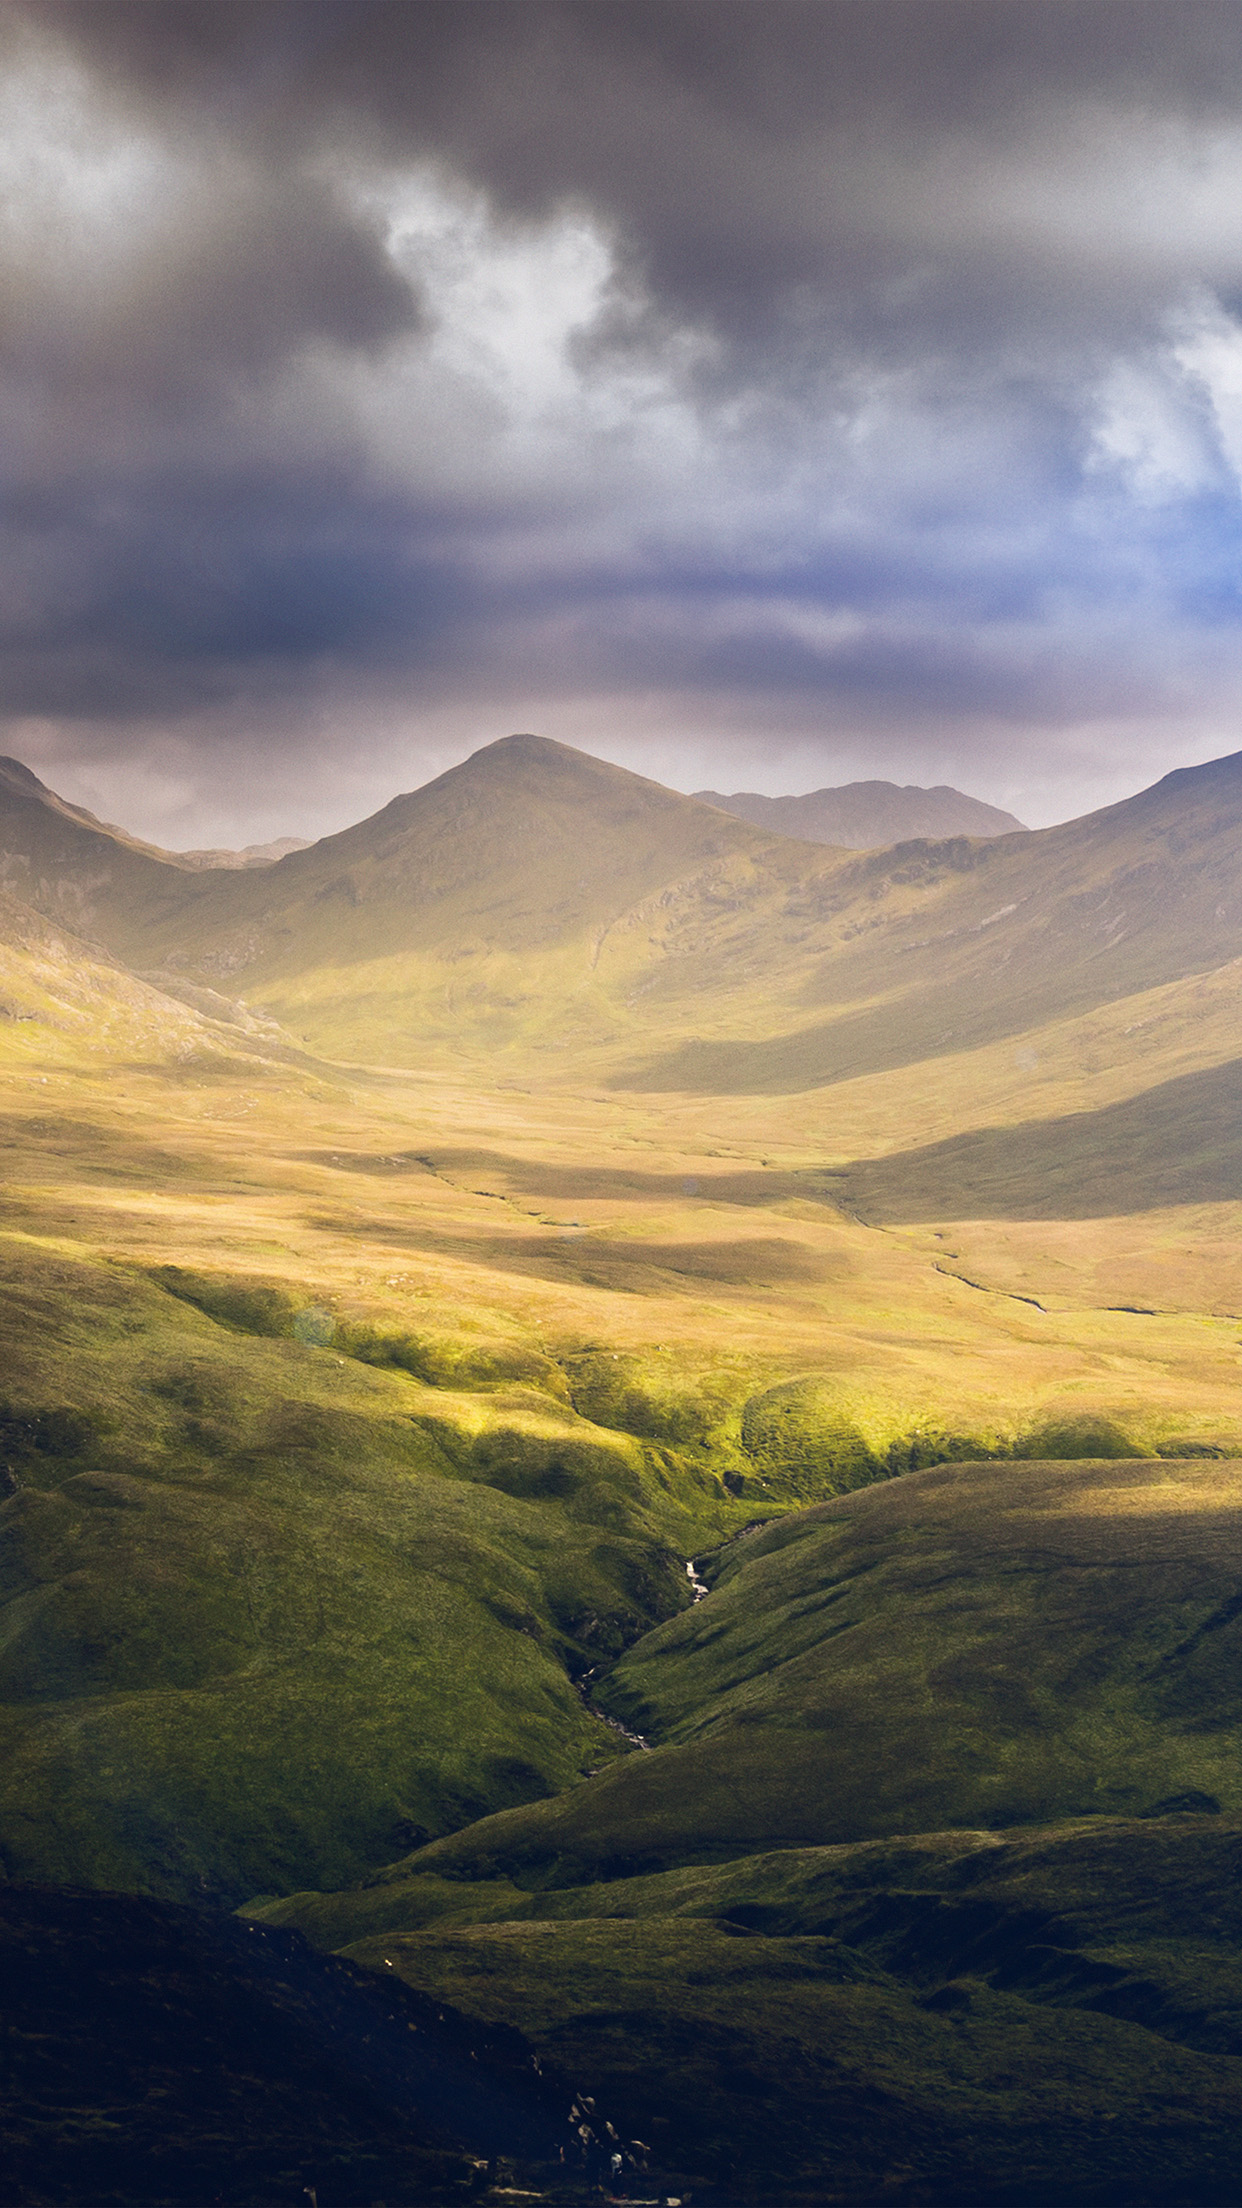 mz31-landscape-green-mountain-windows-nature-flare-wallpaper